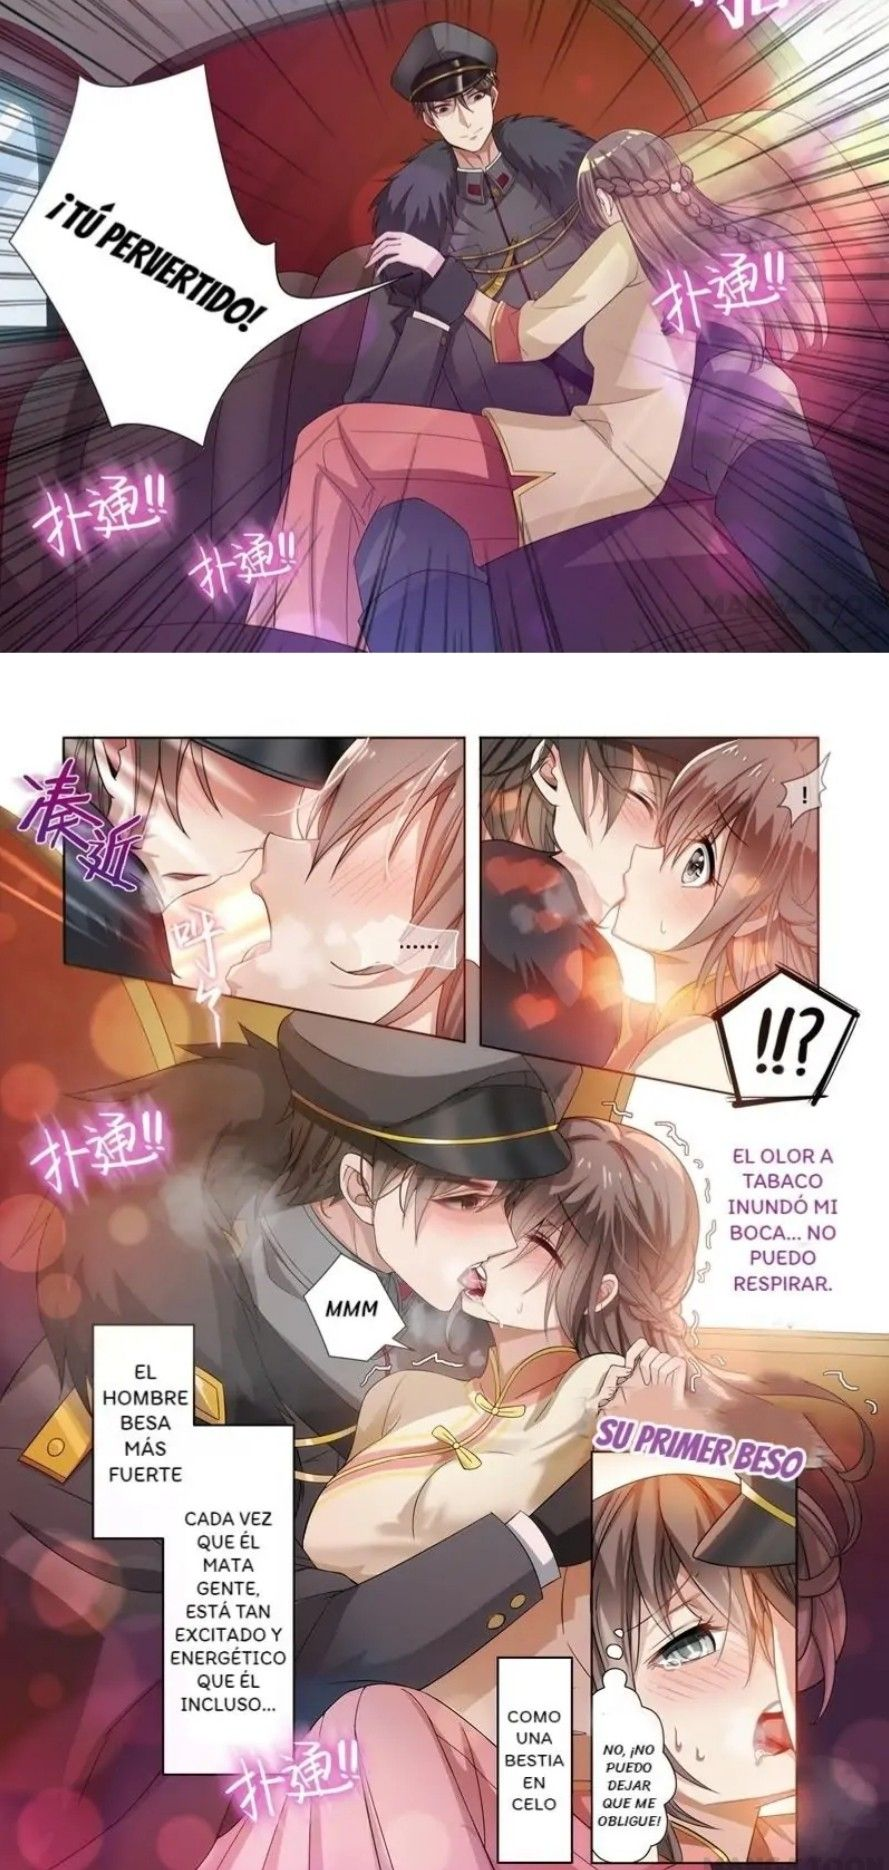 primer beso entre pei si y qingzhou gu アニメカップルの漫画 漫画 アニメ